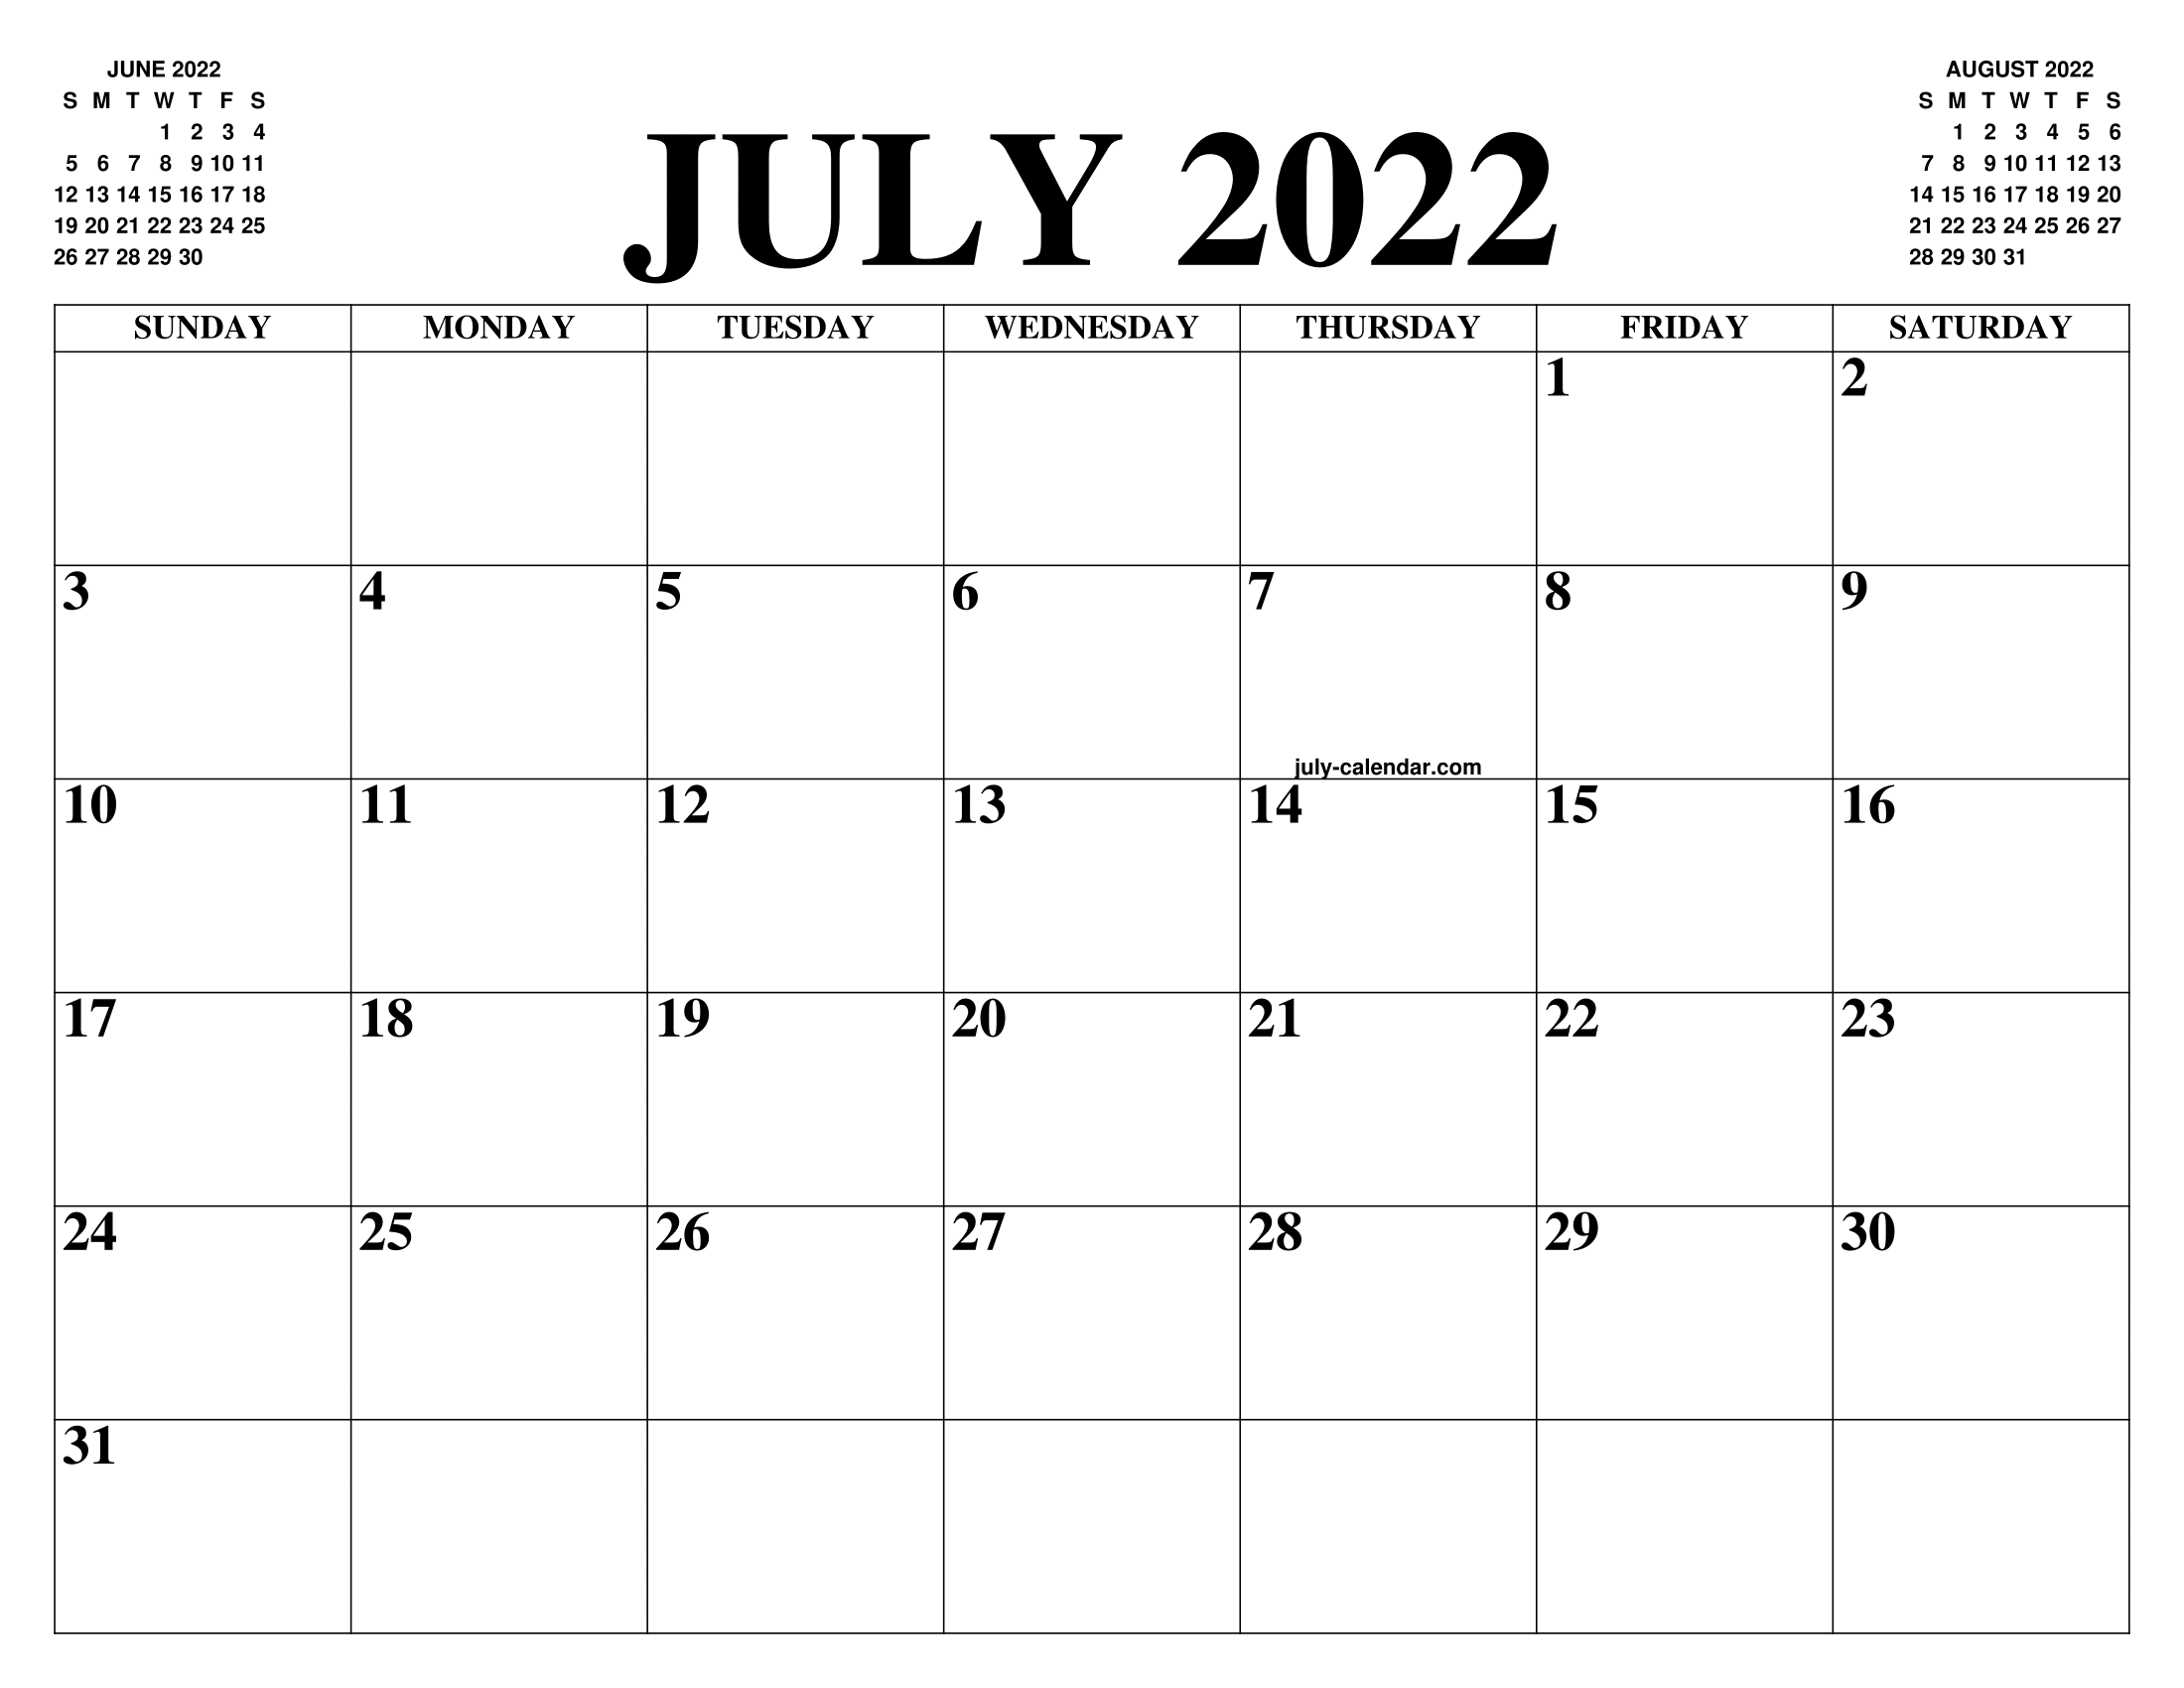 Calendar 2022 July.July 2022 Calendar Of The Month Free Printable July Calendar Of The Year Agenda